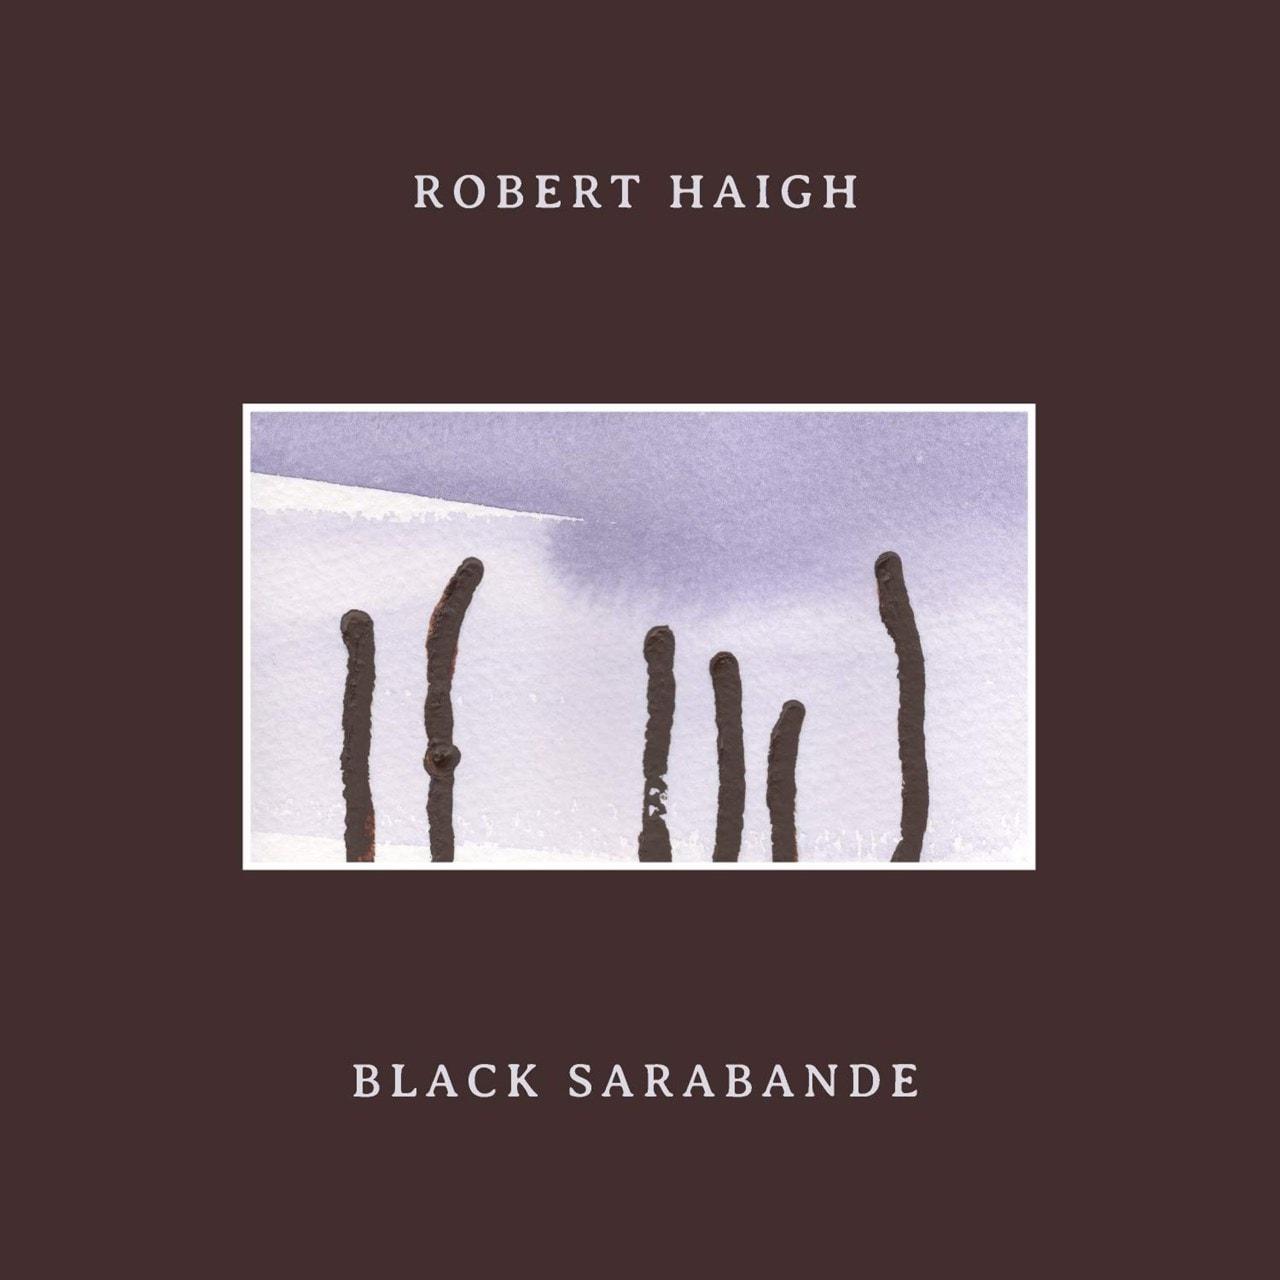 Black Sarabande - 1